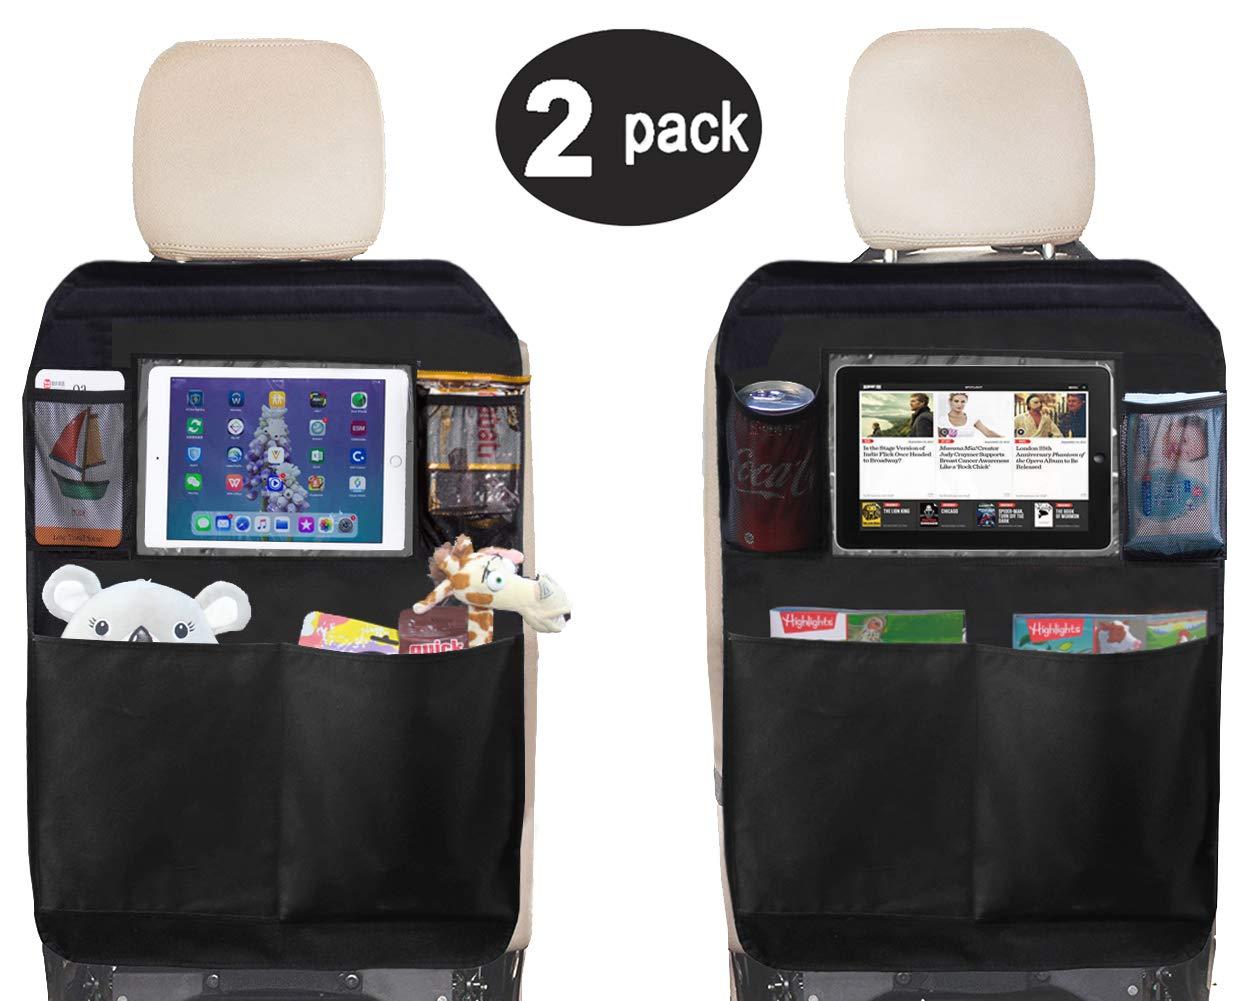 Sleeping Lamb Kick Mat Seat Back Protectors with PVC Pockets Seat Covers for Car Backseat, 2 Pack (Black 2)